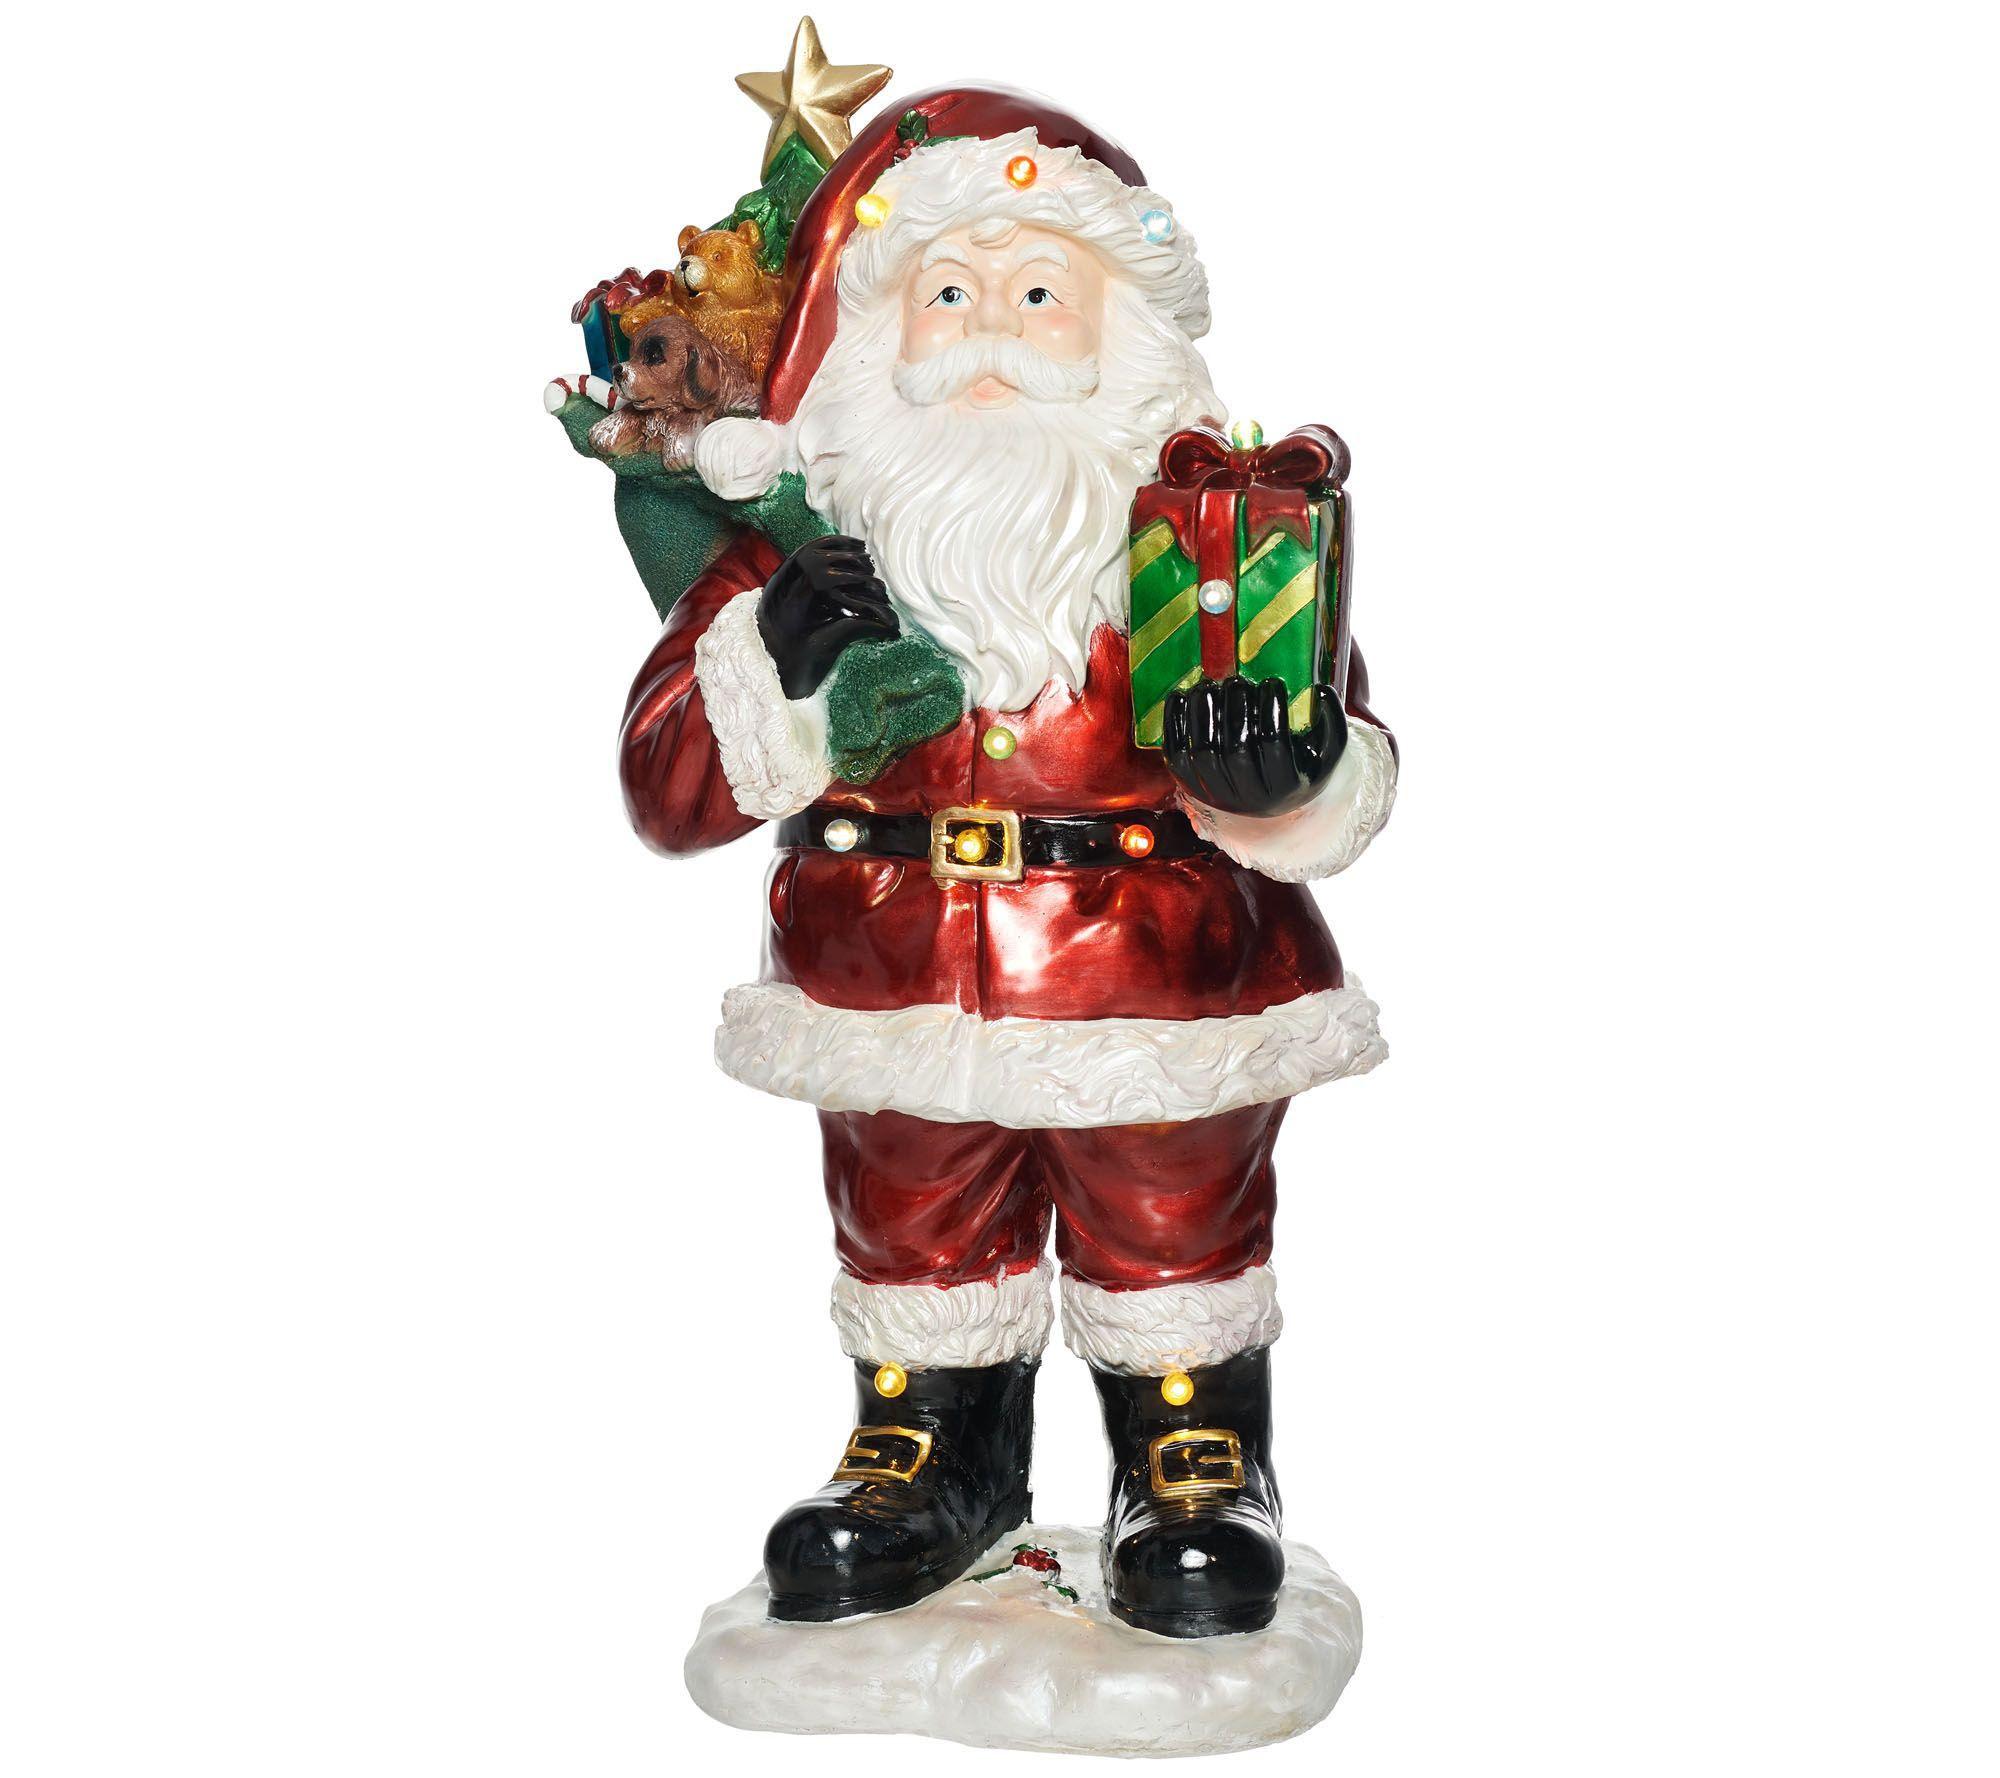 Kringle Express Indooroutdoor 37 Illuminated Santa Claus With Gift Bag